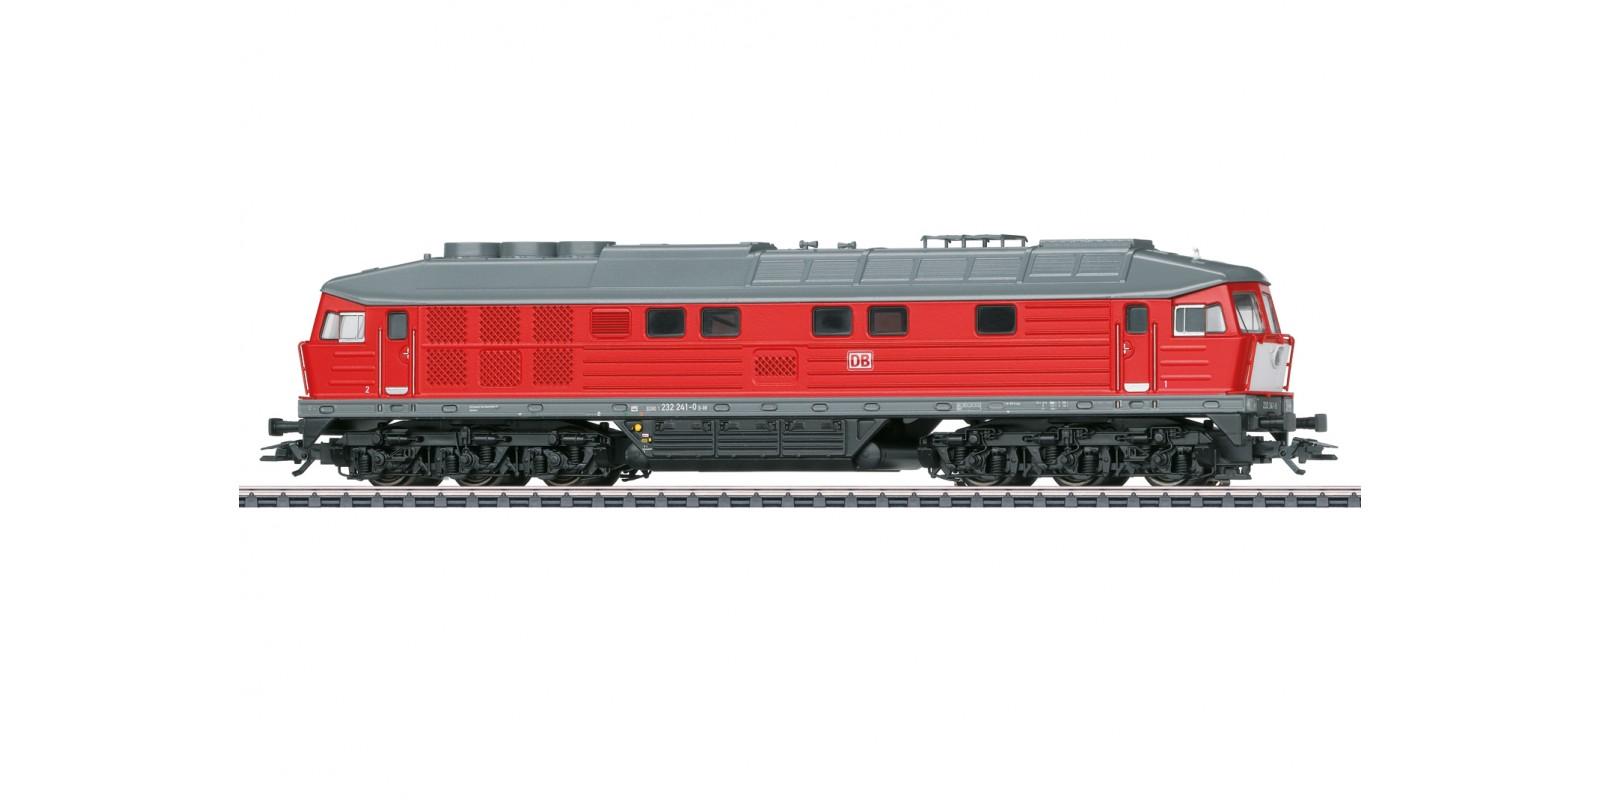 36435 Class 232 Diesel Locomotive